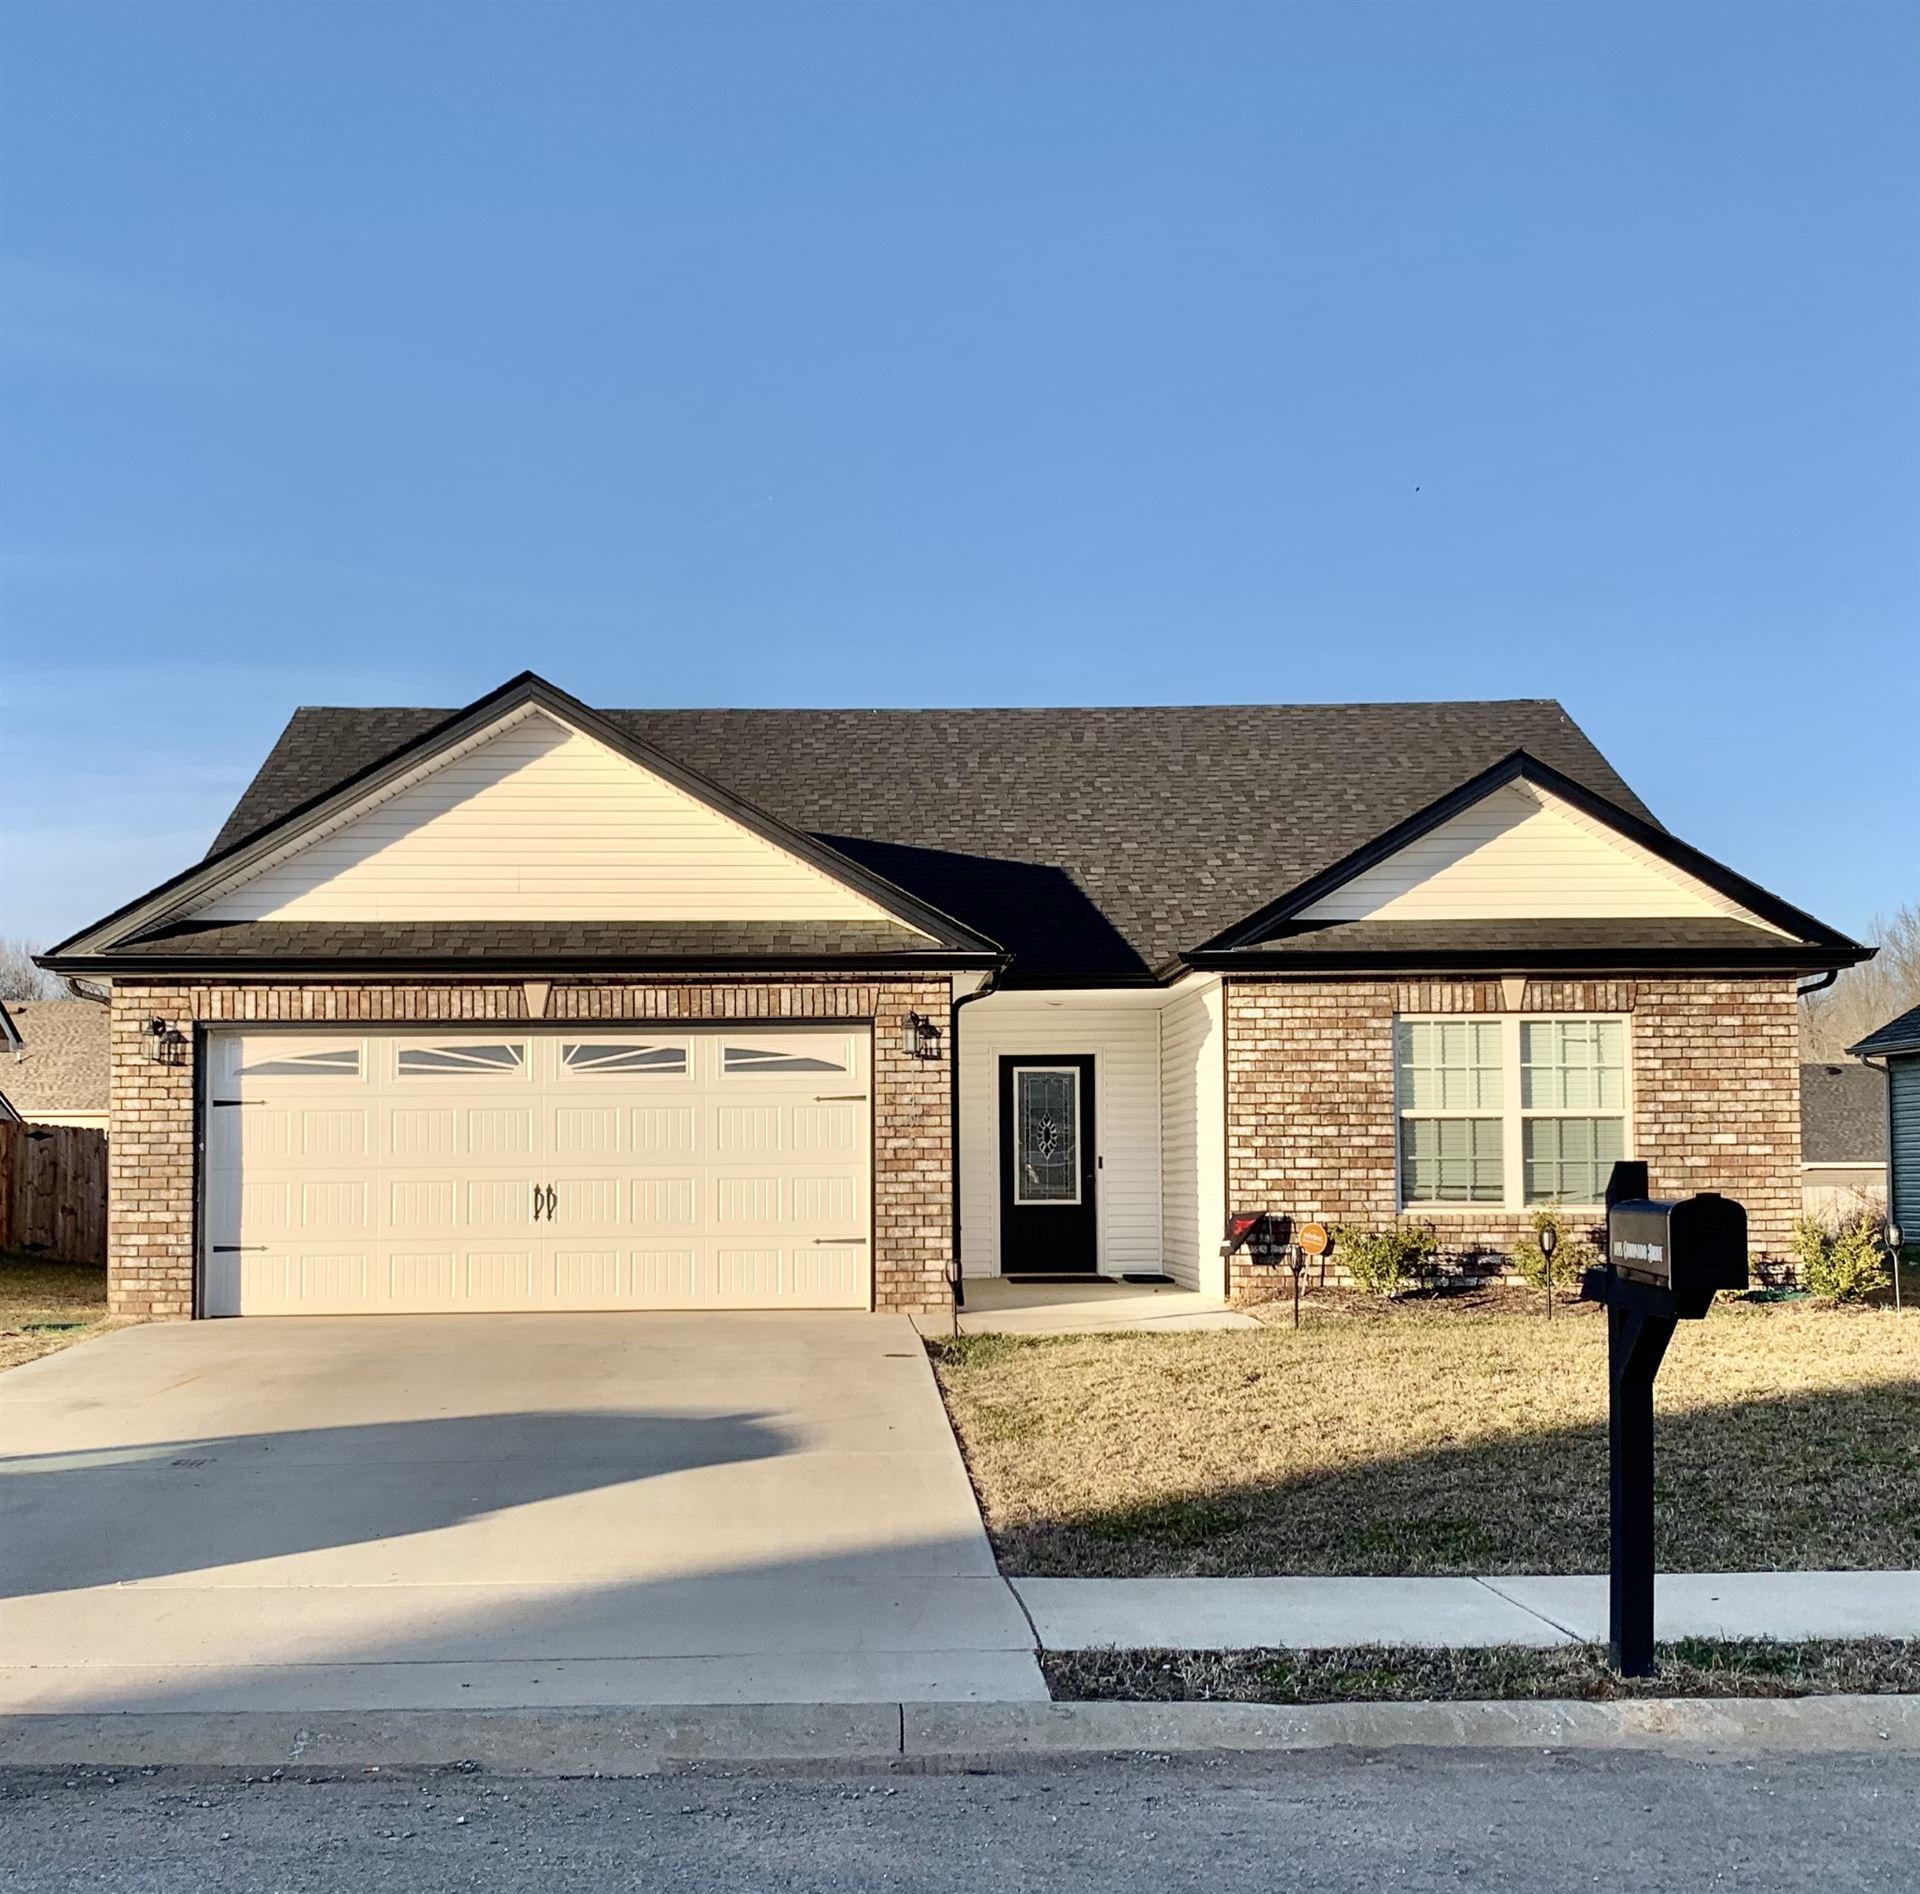 1495 Coronado Dr, Clarksville, TN 37042 - MLS#: 2220372